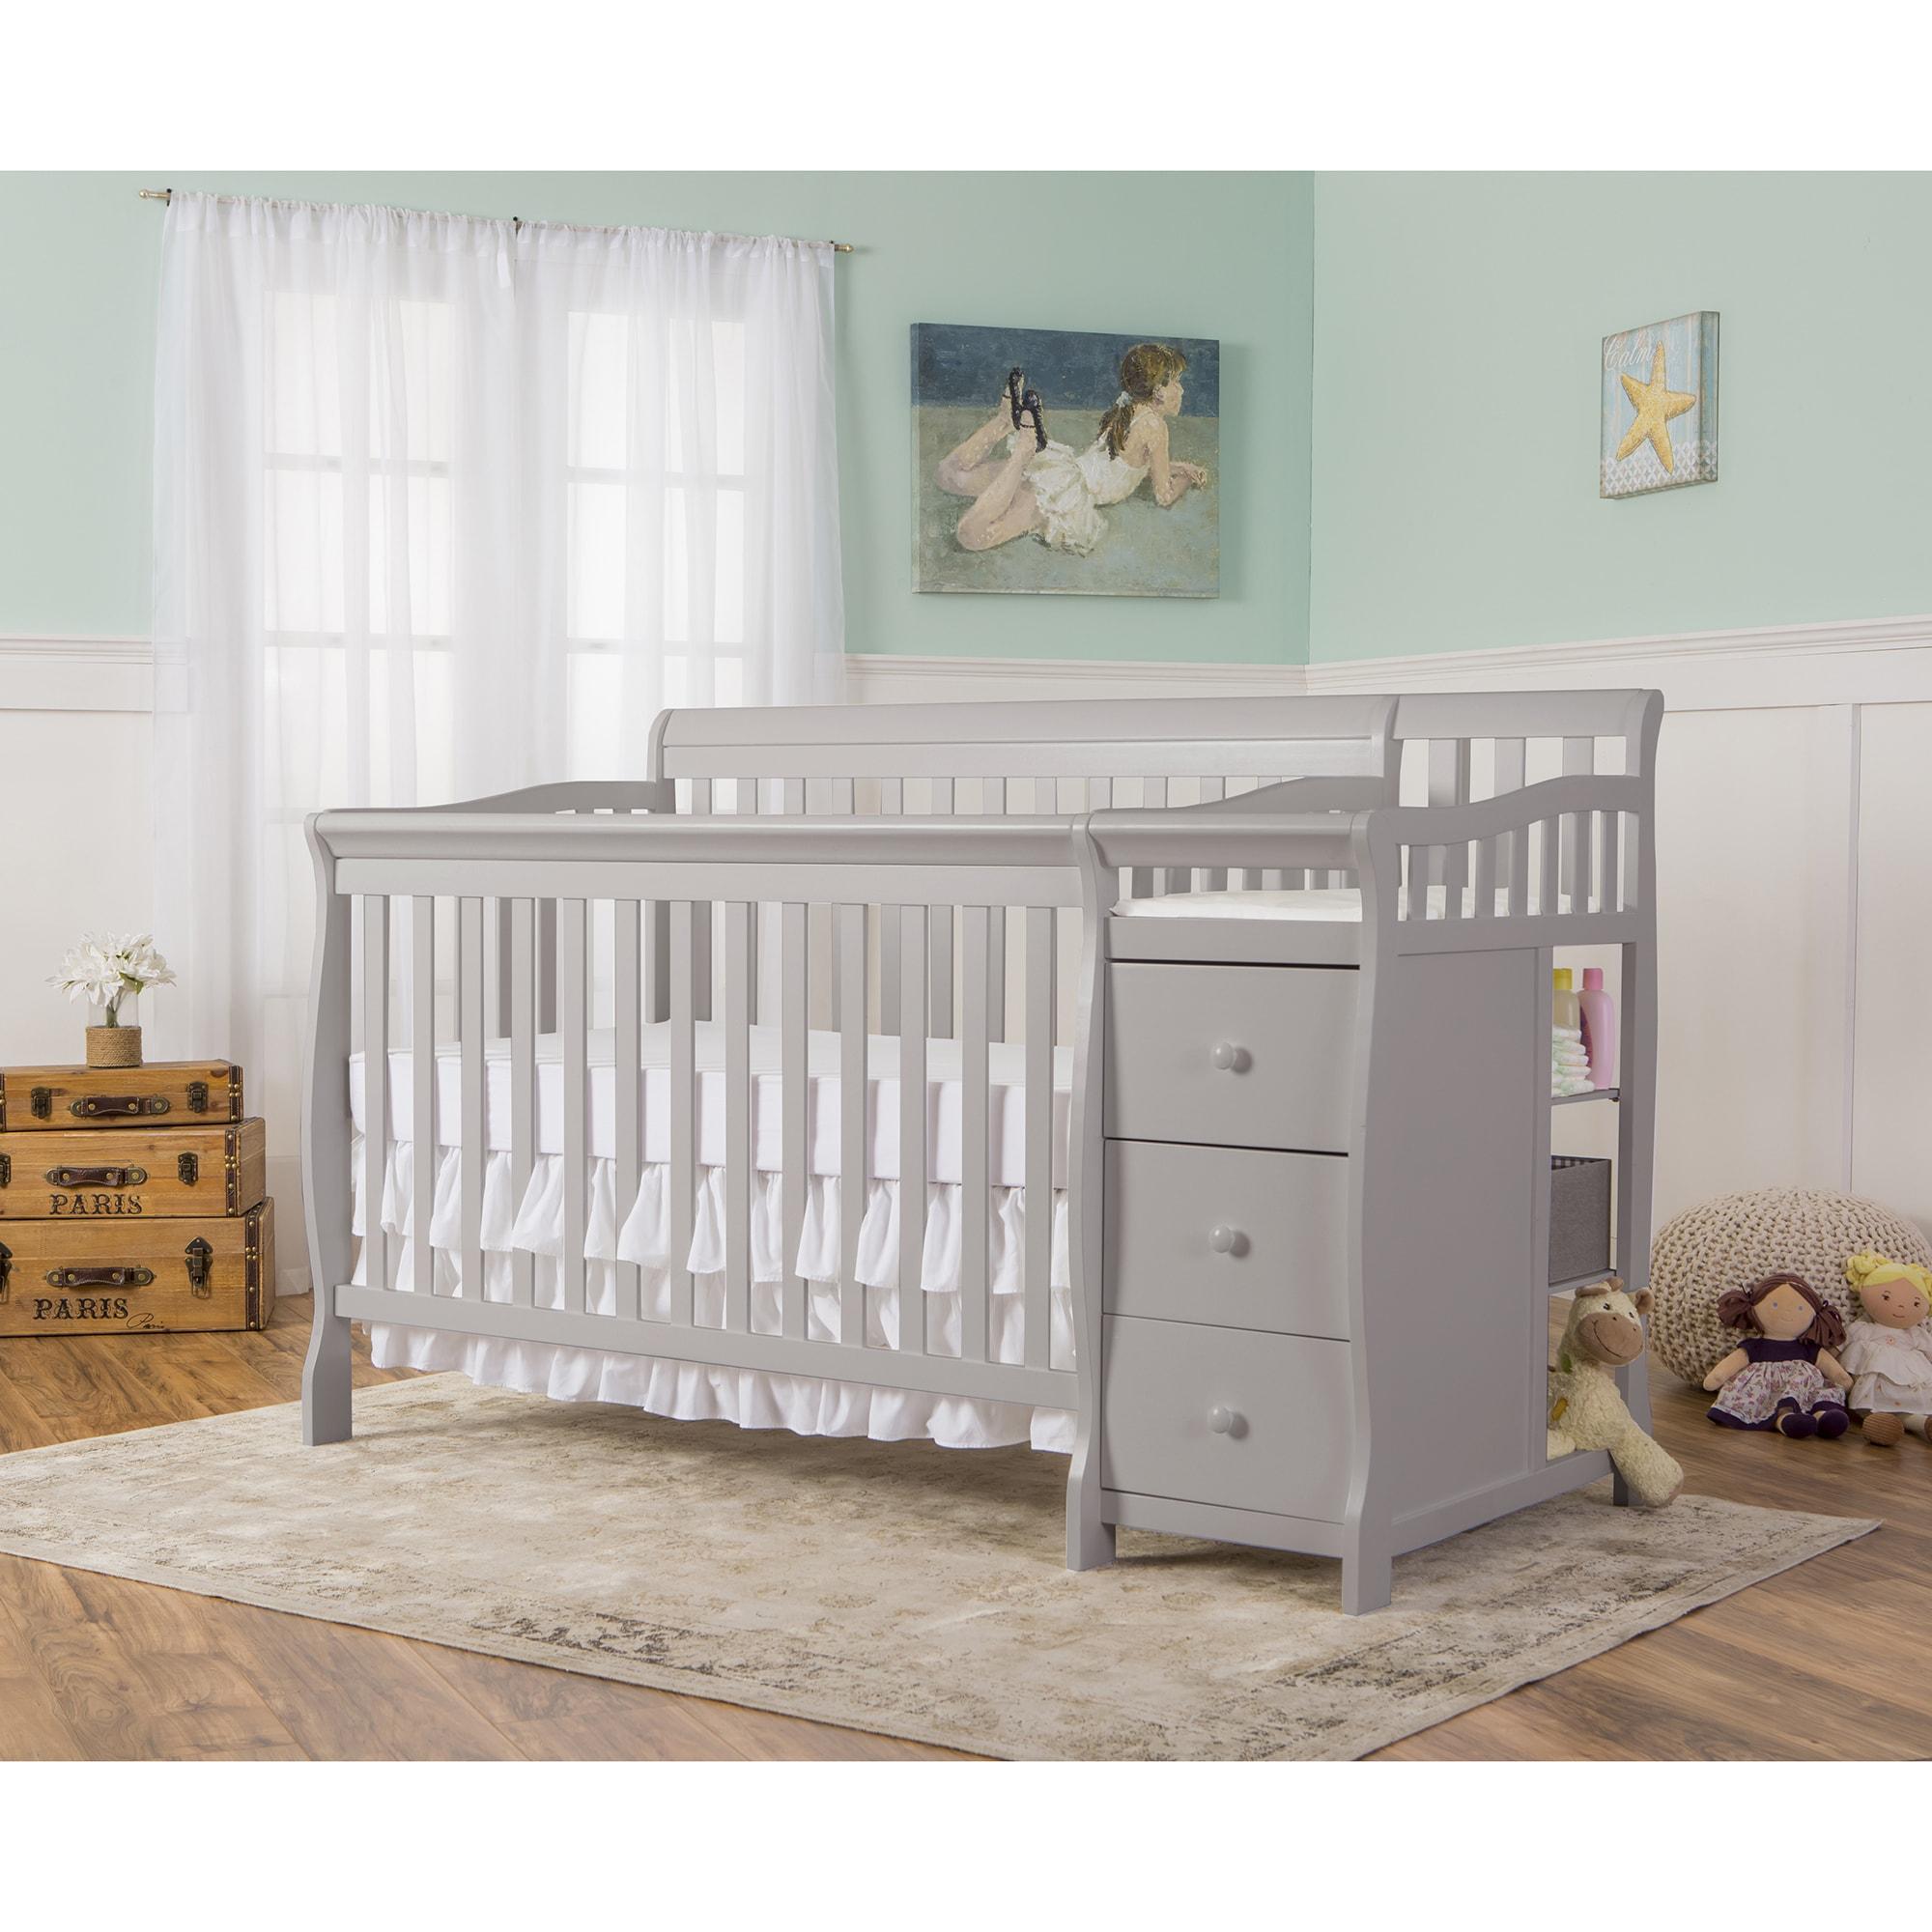 Dream On Me Universal Convertible Crib Toddler Guard Rail Pebble Gray